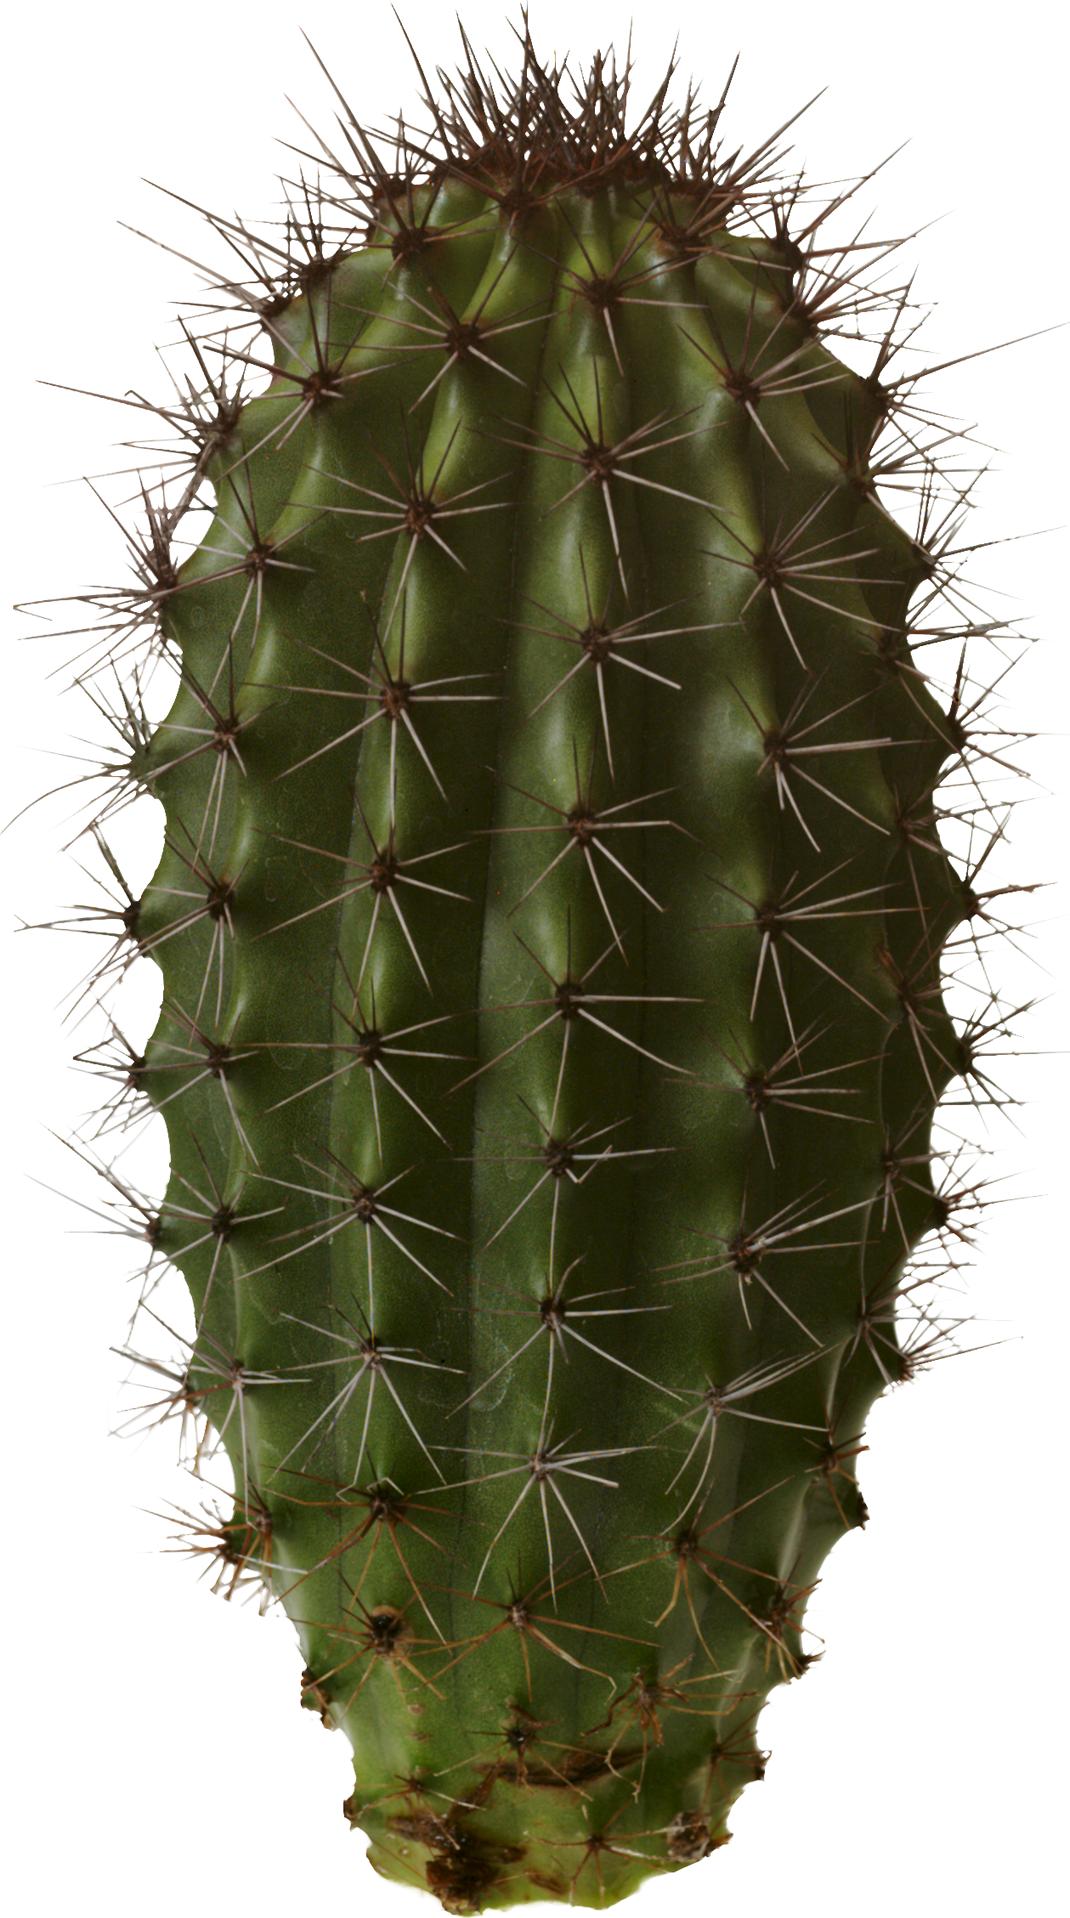 Cactus Png image #24259 - Cactus PNG